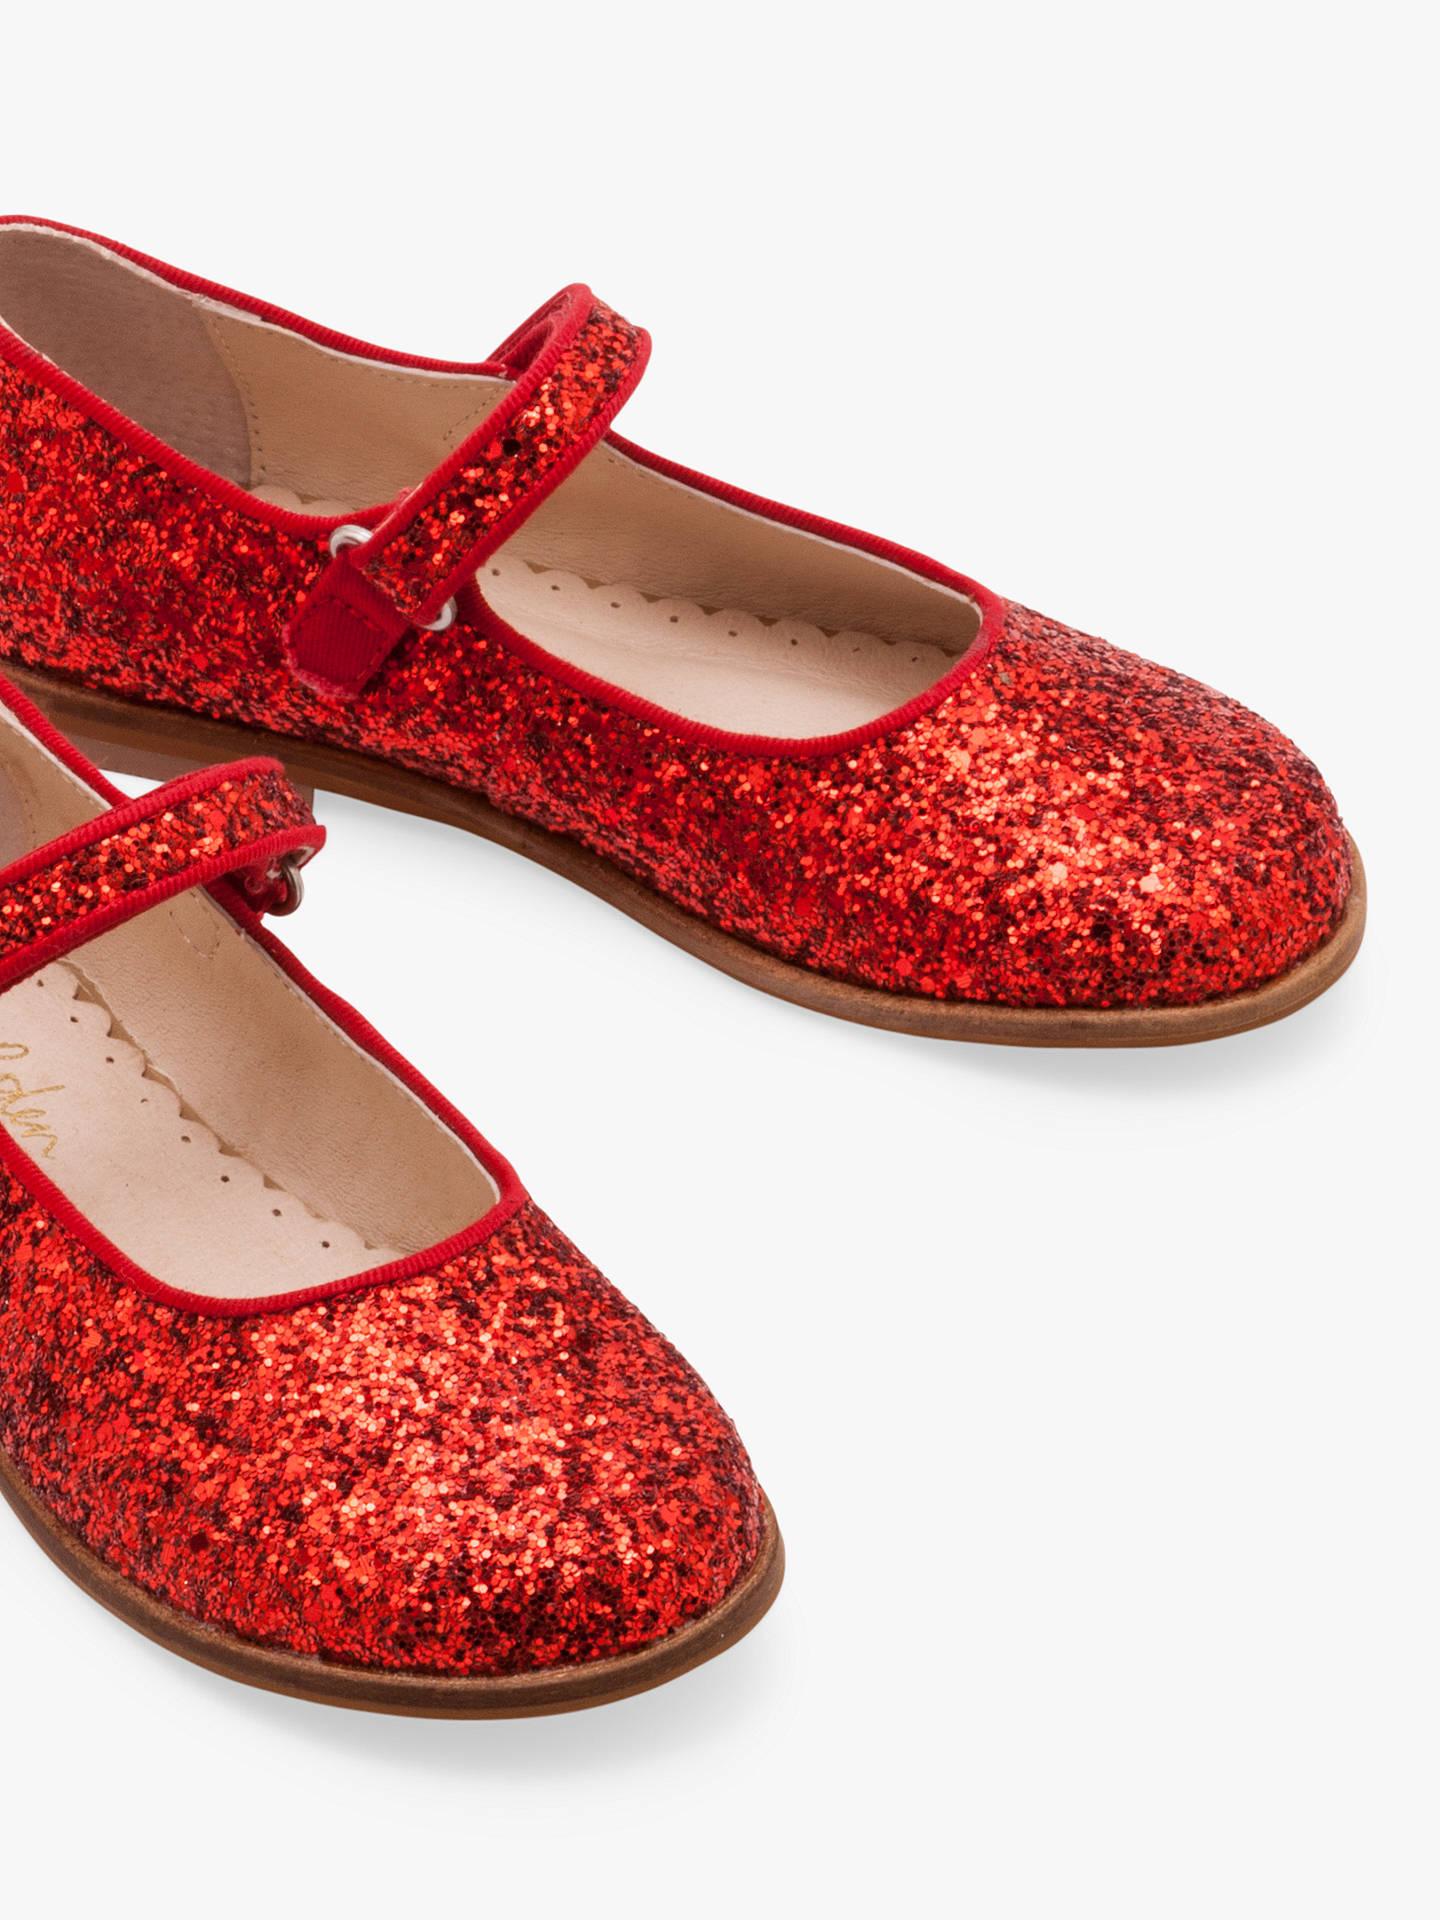 Mini Boden Children S Glitter Mary Jane Shoes Red At John